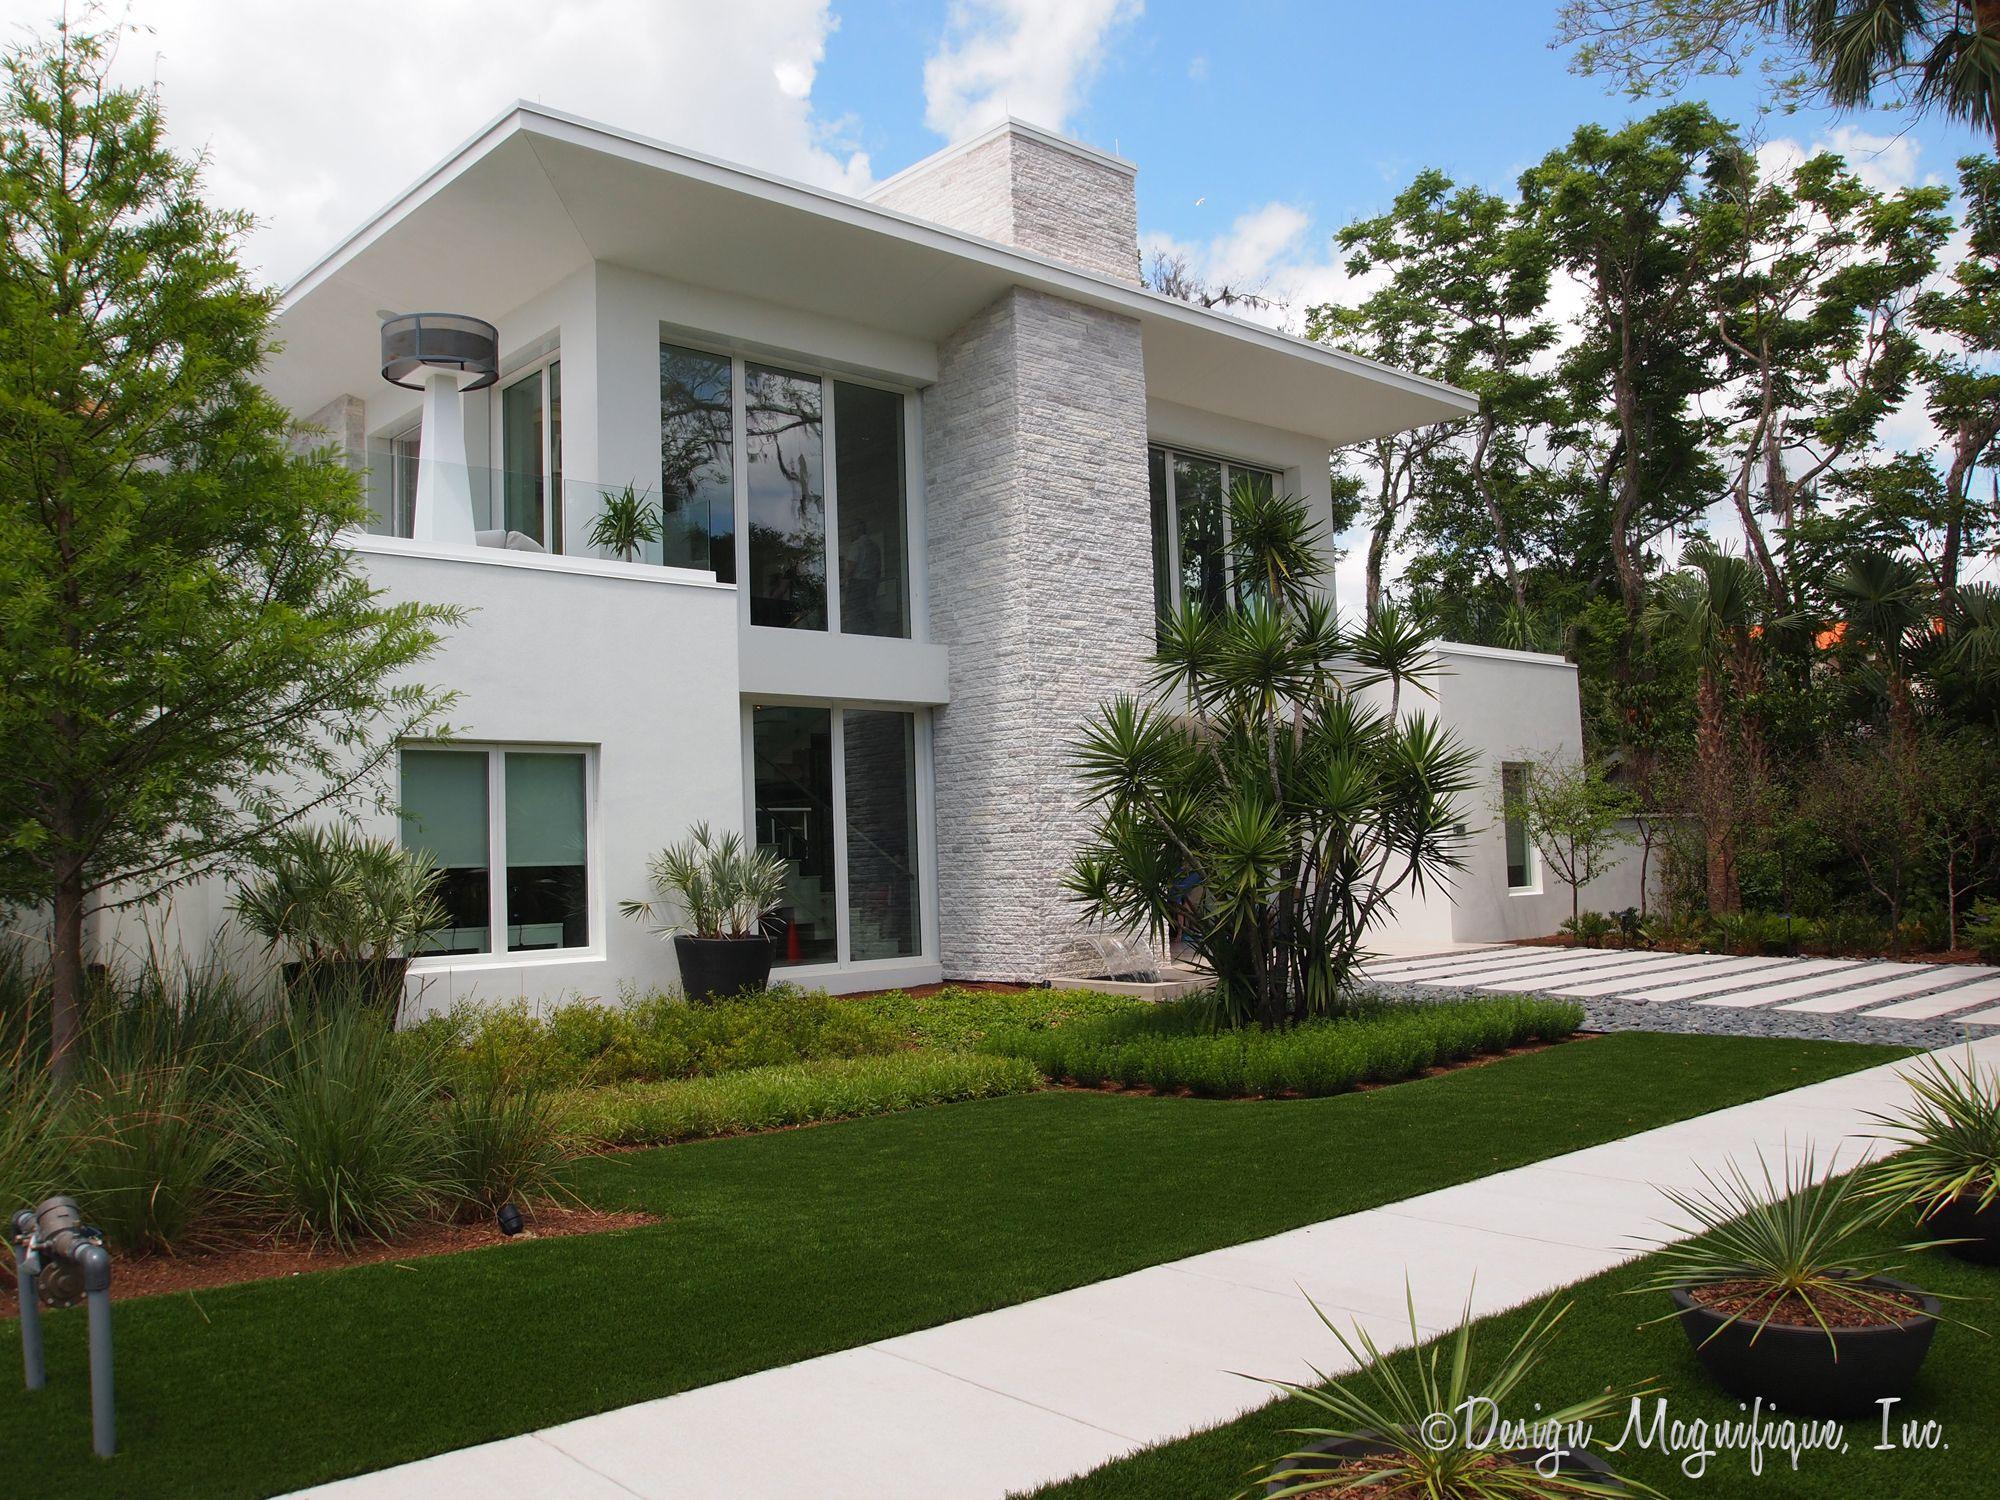 Architectural modern home design plans house ideas ranch designs amazing florida rejig architecture photo exterior free interior also rh pinterest